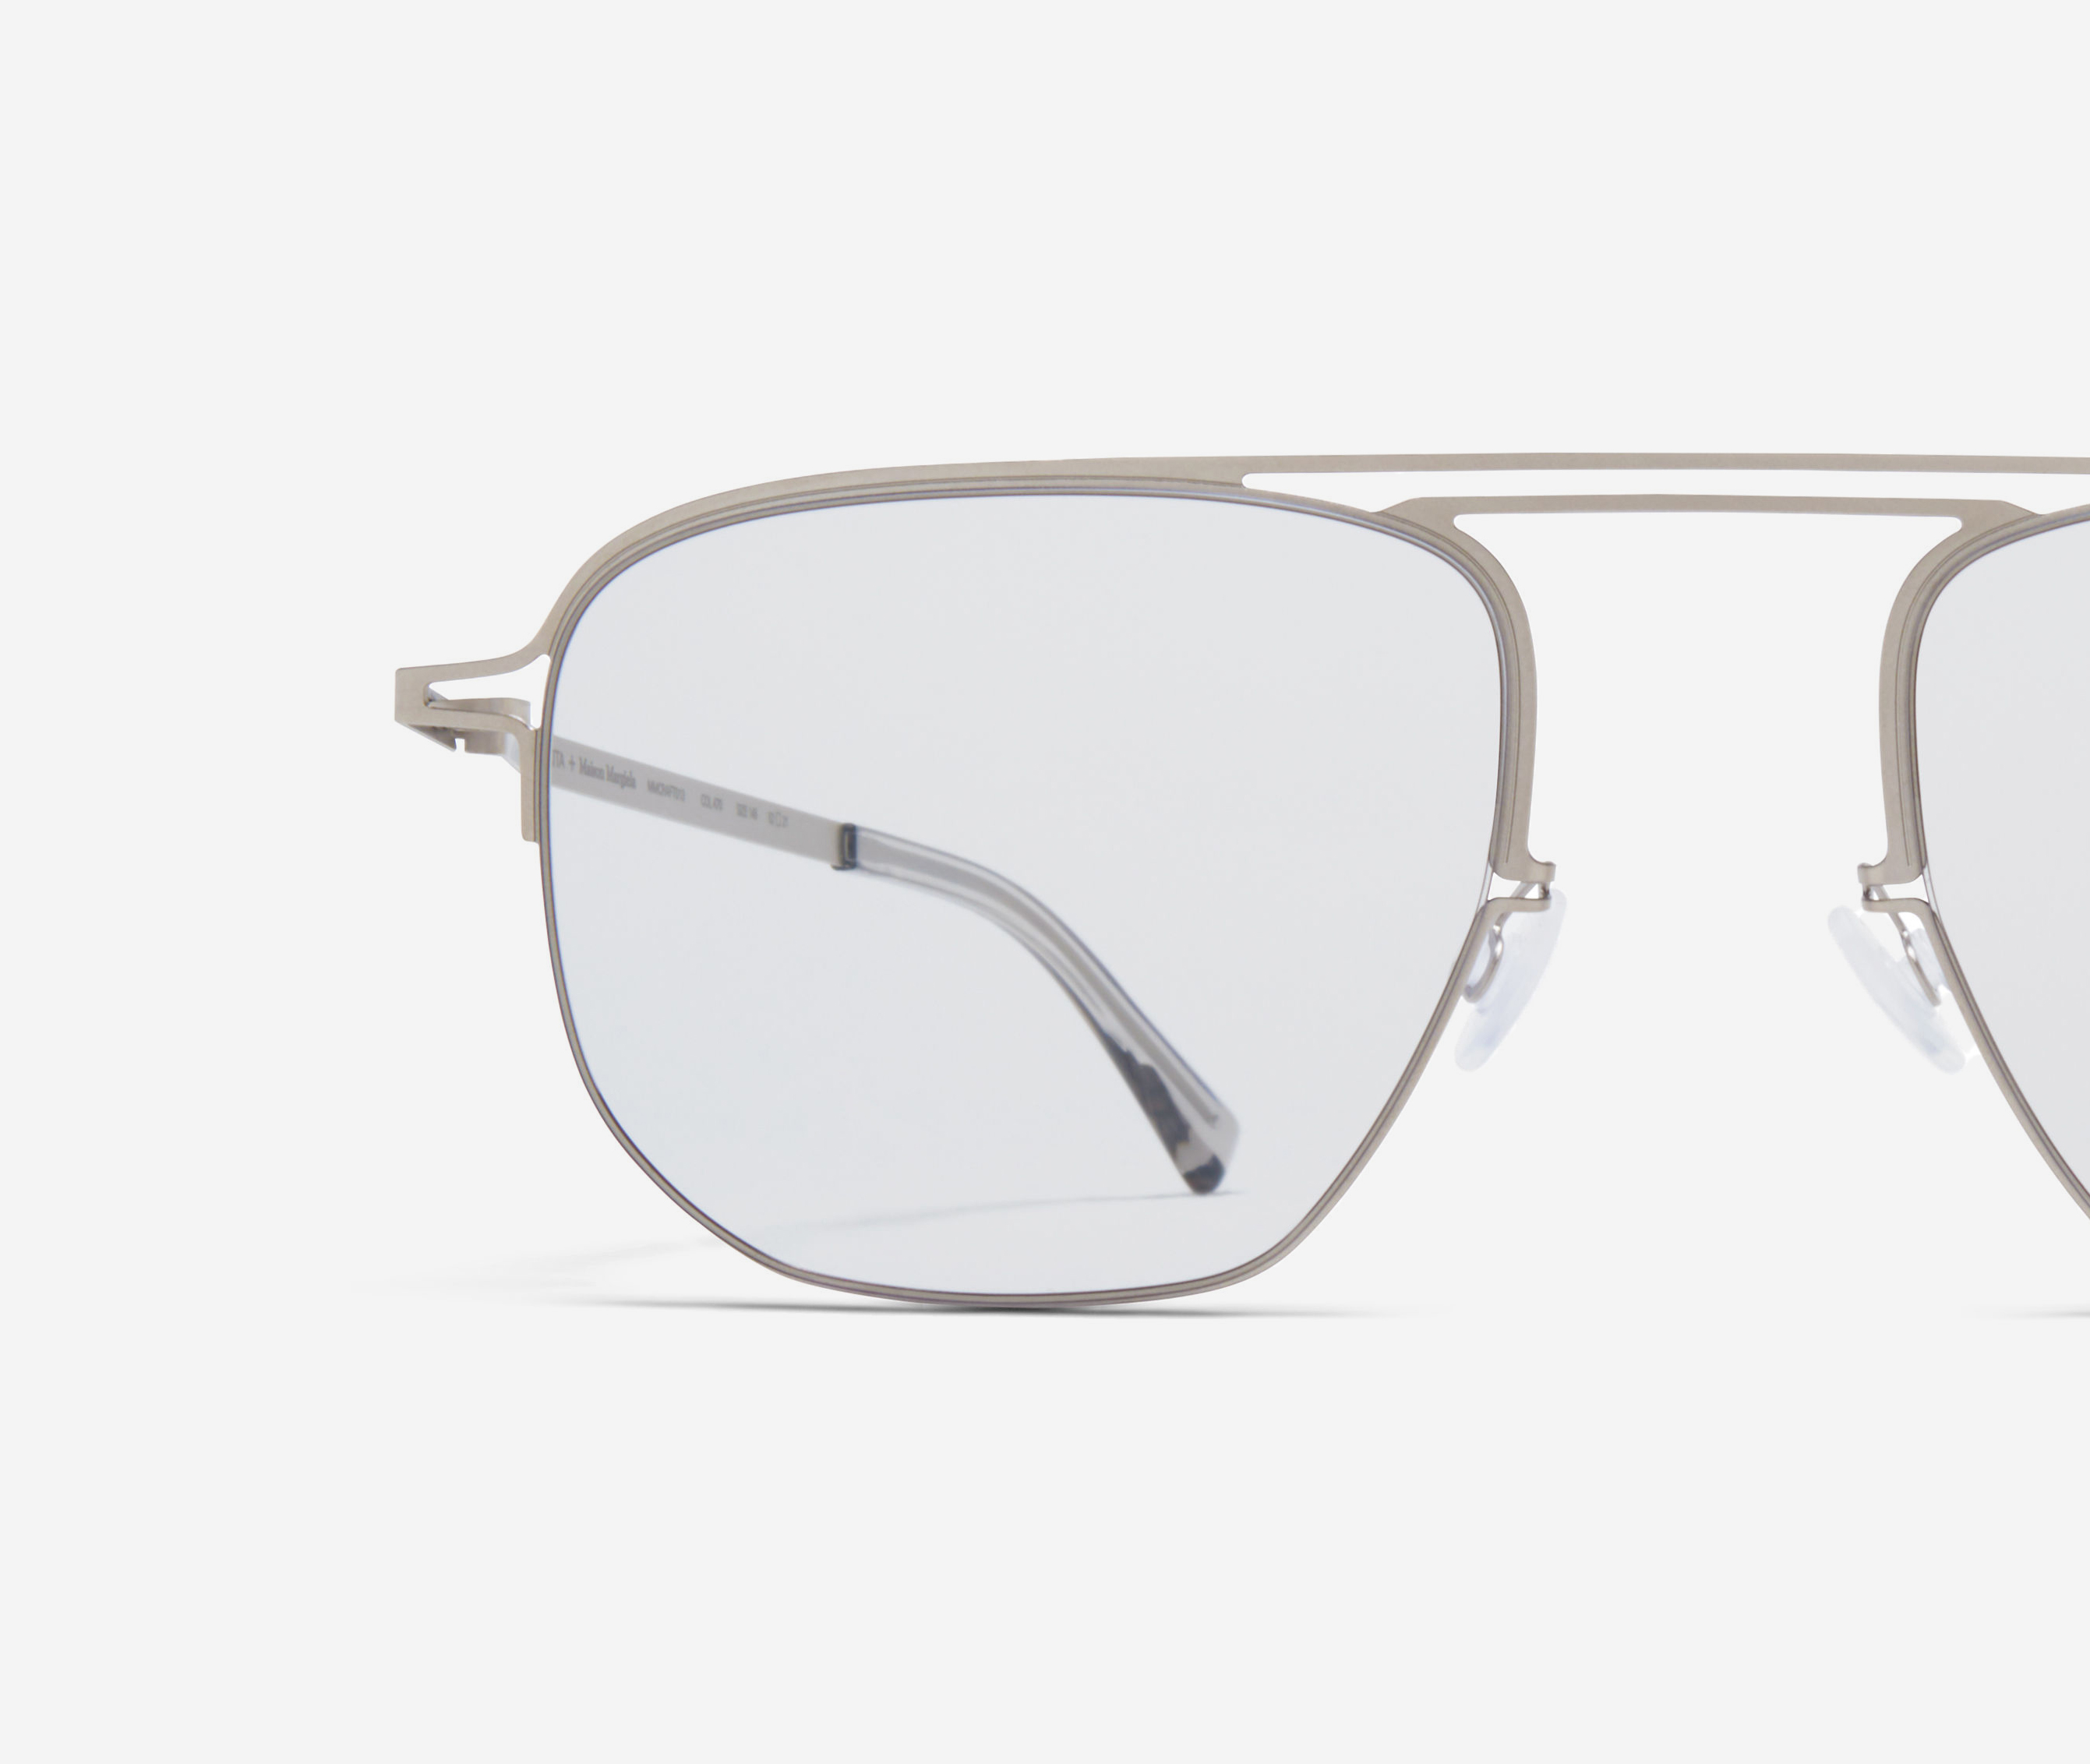 MYKITA® Designer Sunglasses Official Online Shop